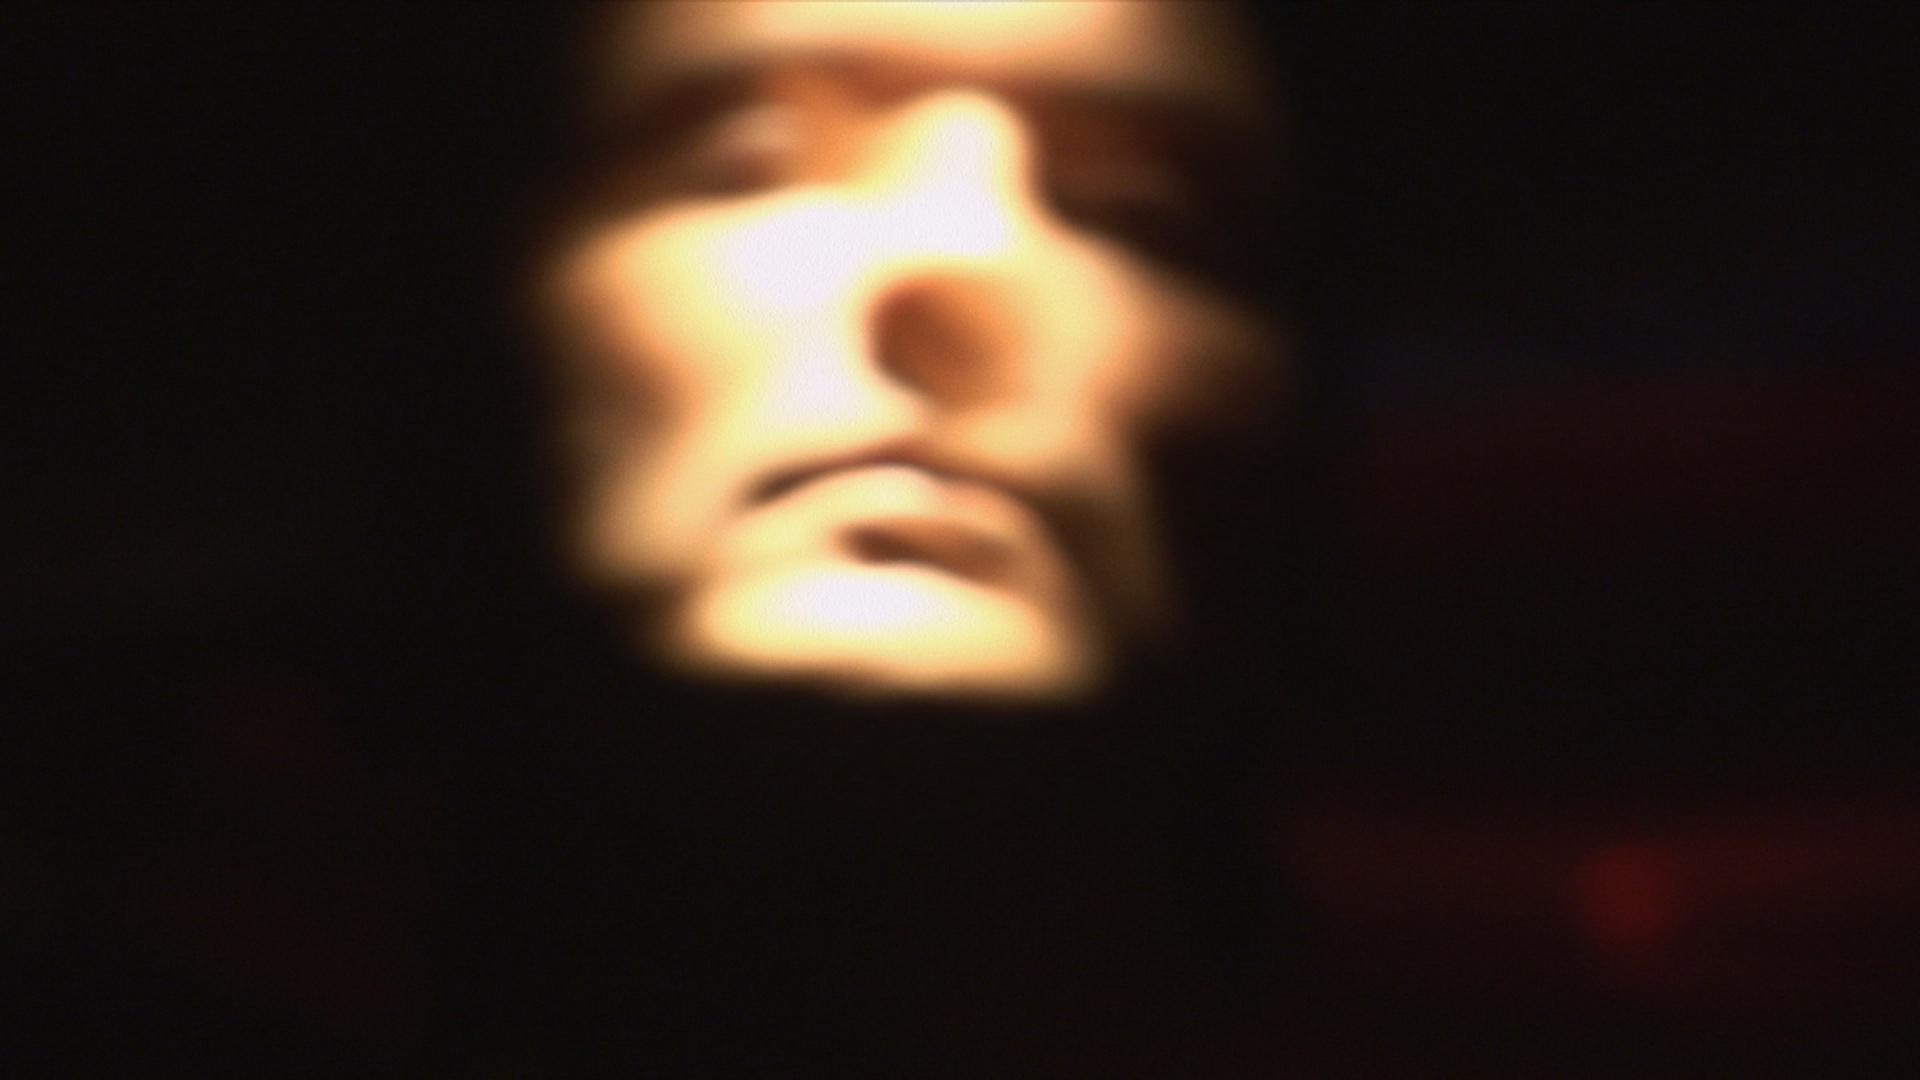 Rohan Quine, 'The Imagination Thief' - film 'KIM 42', still 14